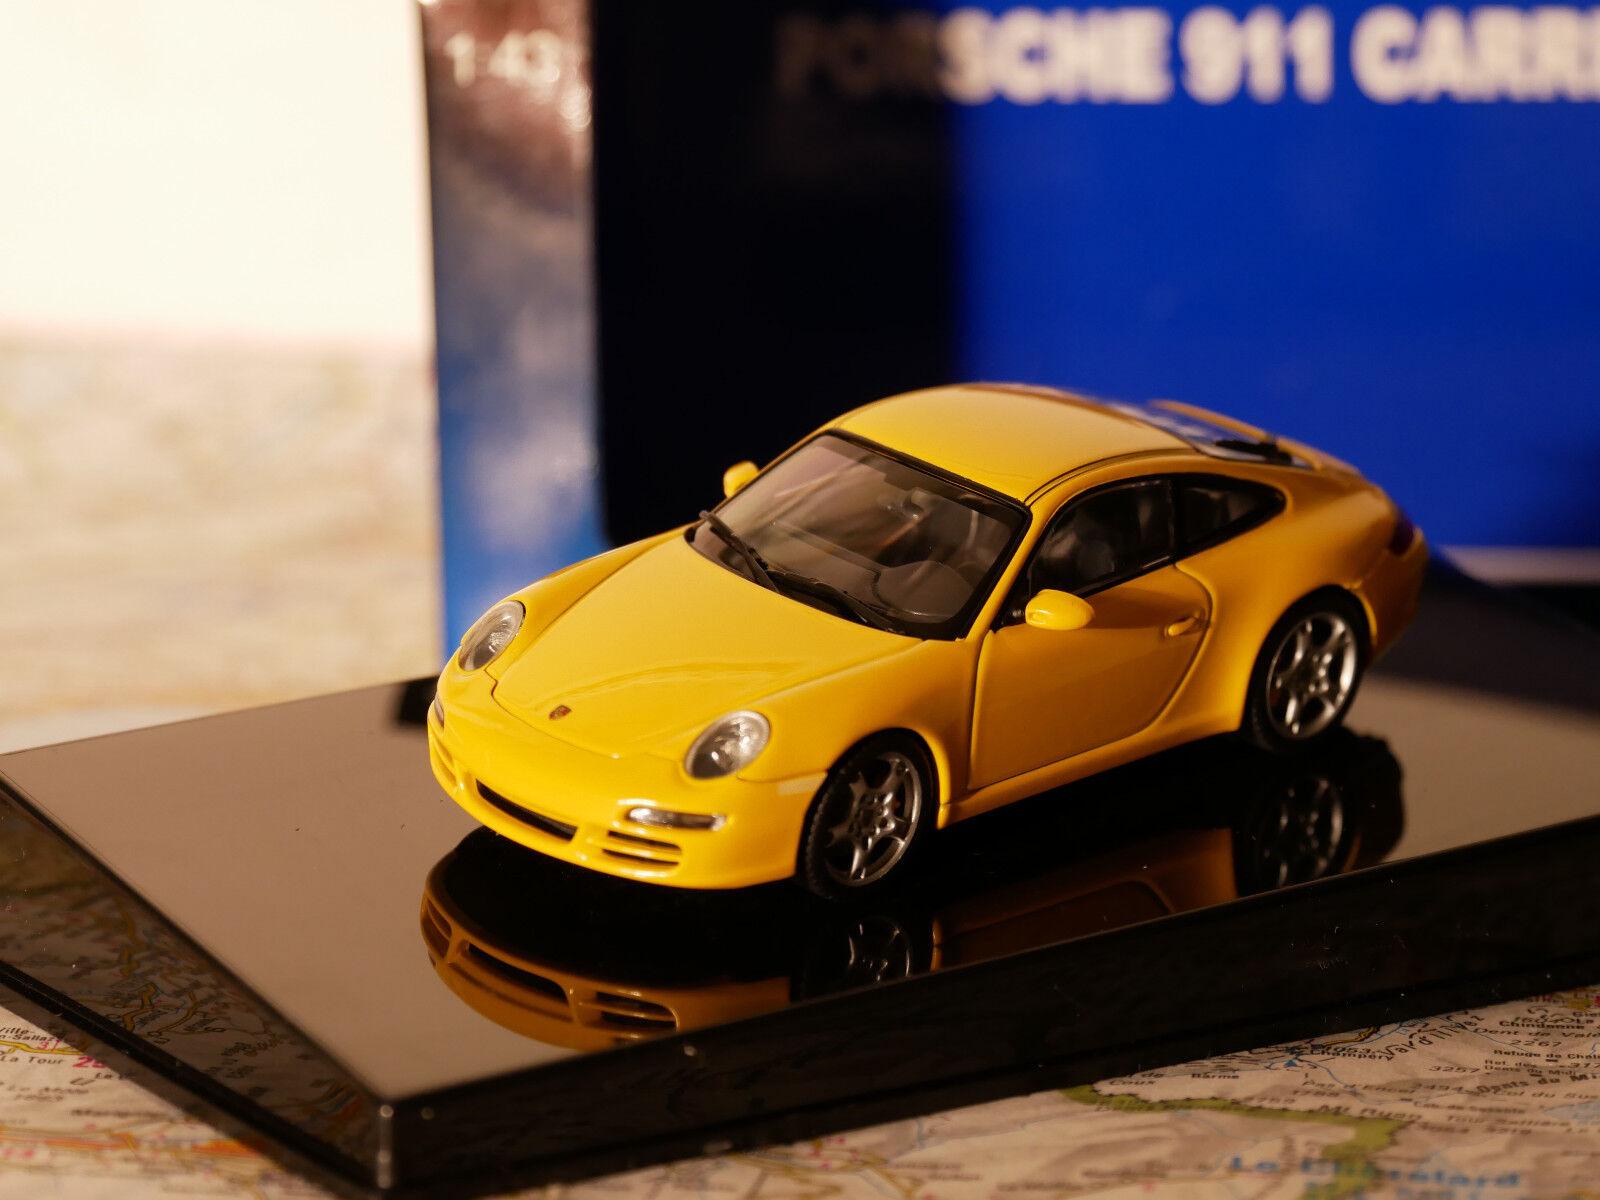 AUTO ART PORSCHE 911 ( 997) CARRERA S 1 43 + BOX YELLOW ART.57882  NEW DIE-CAST